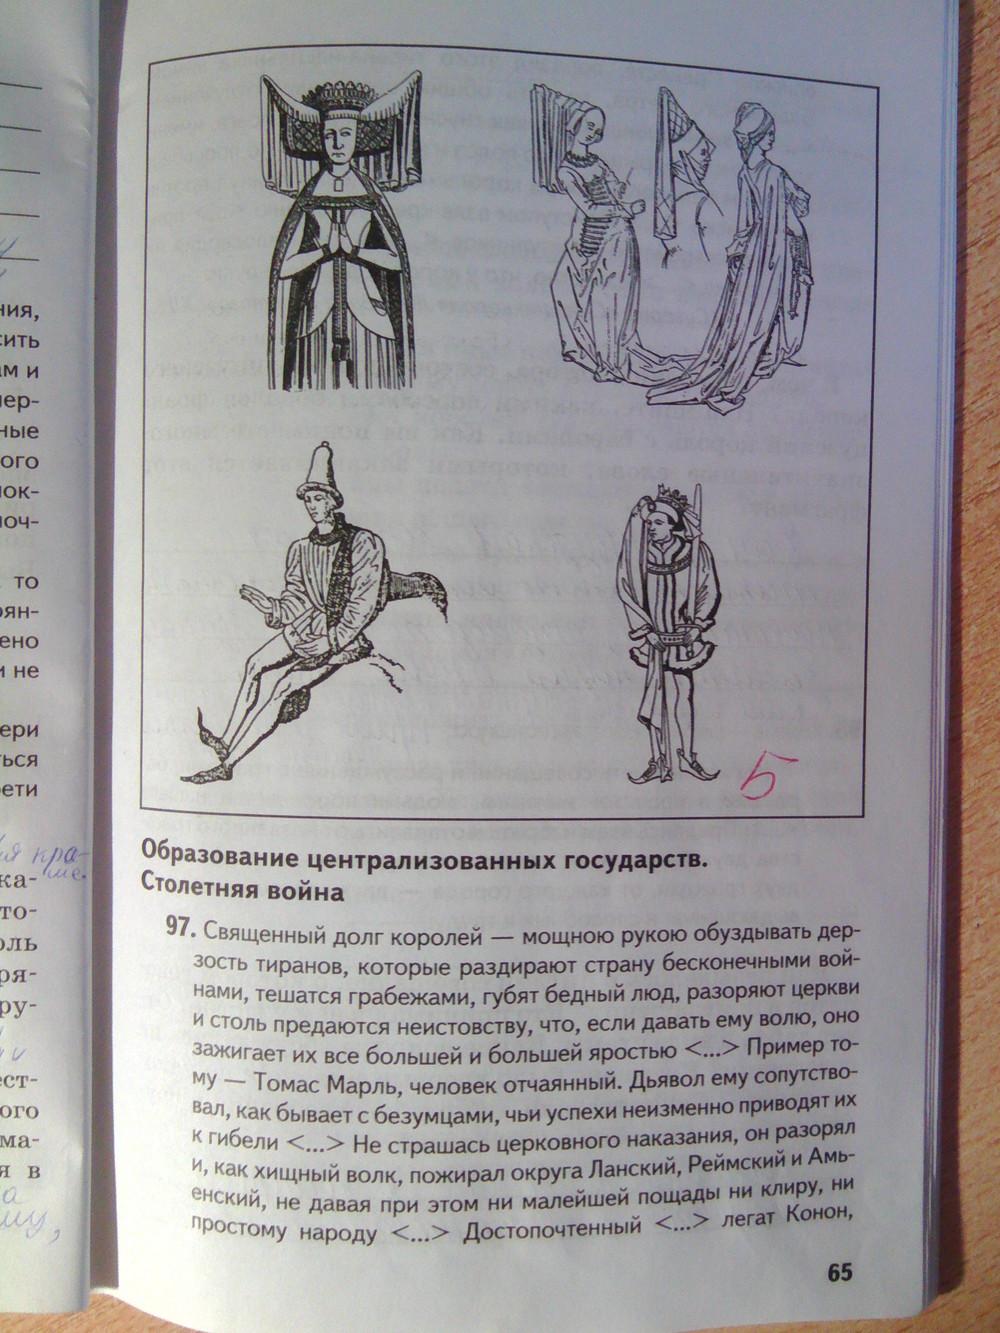 а учебнику гдз класс истории по 6 к бойцова м